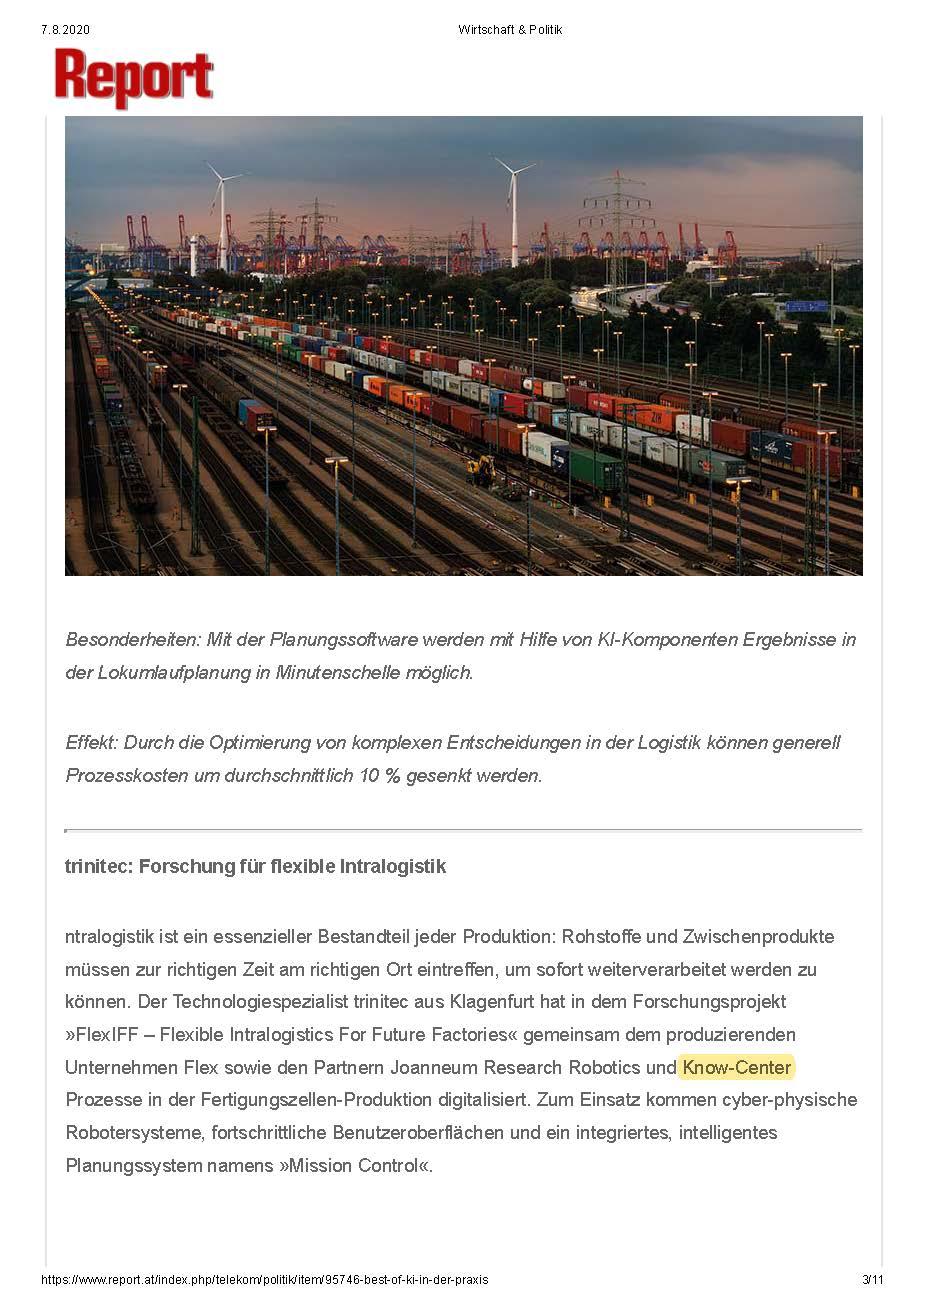 2020-08-07_Report.at_Best of KI in der Praxis_Seite_3